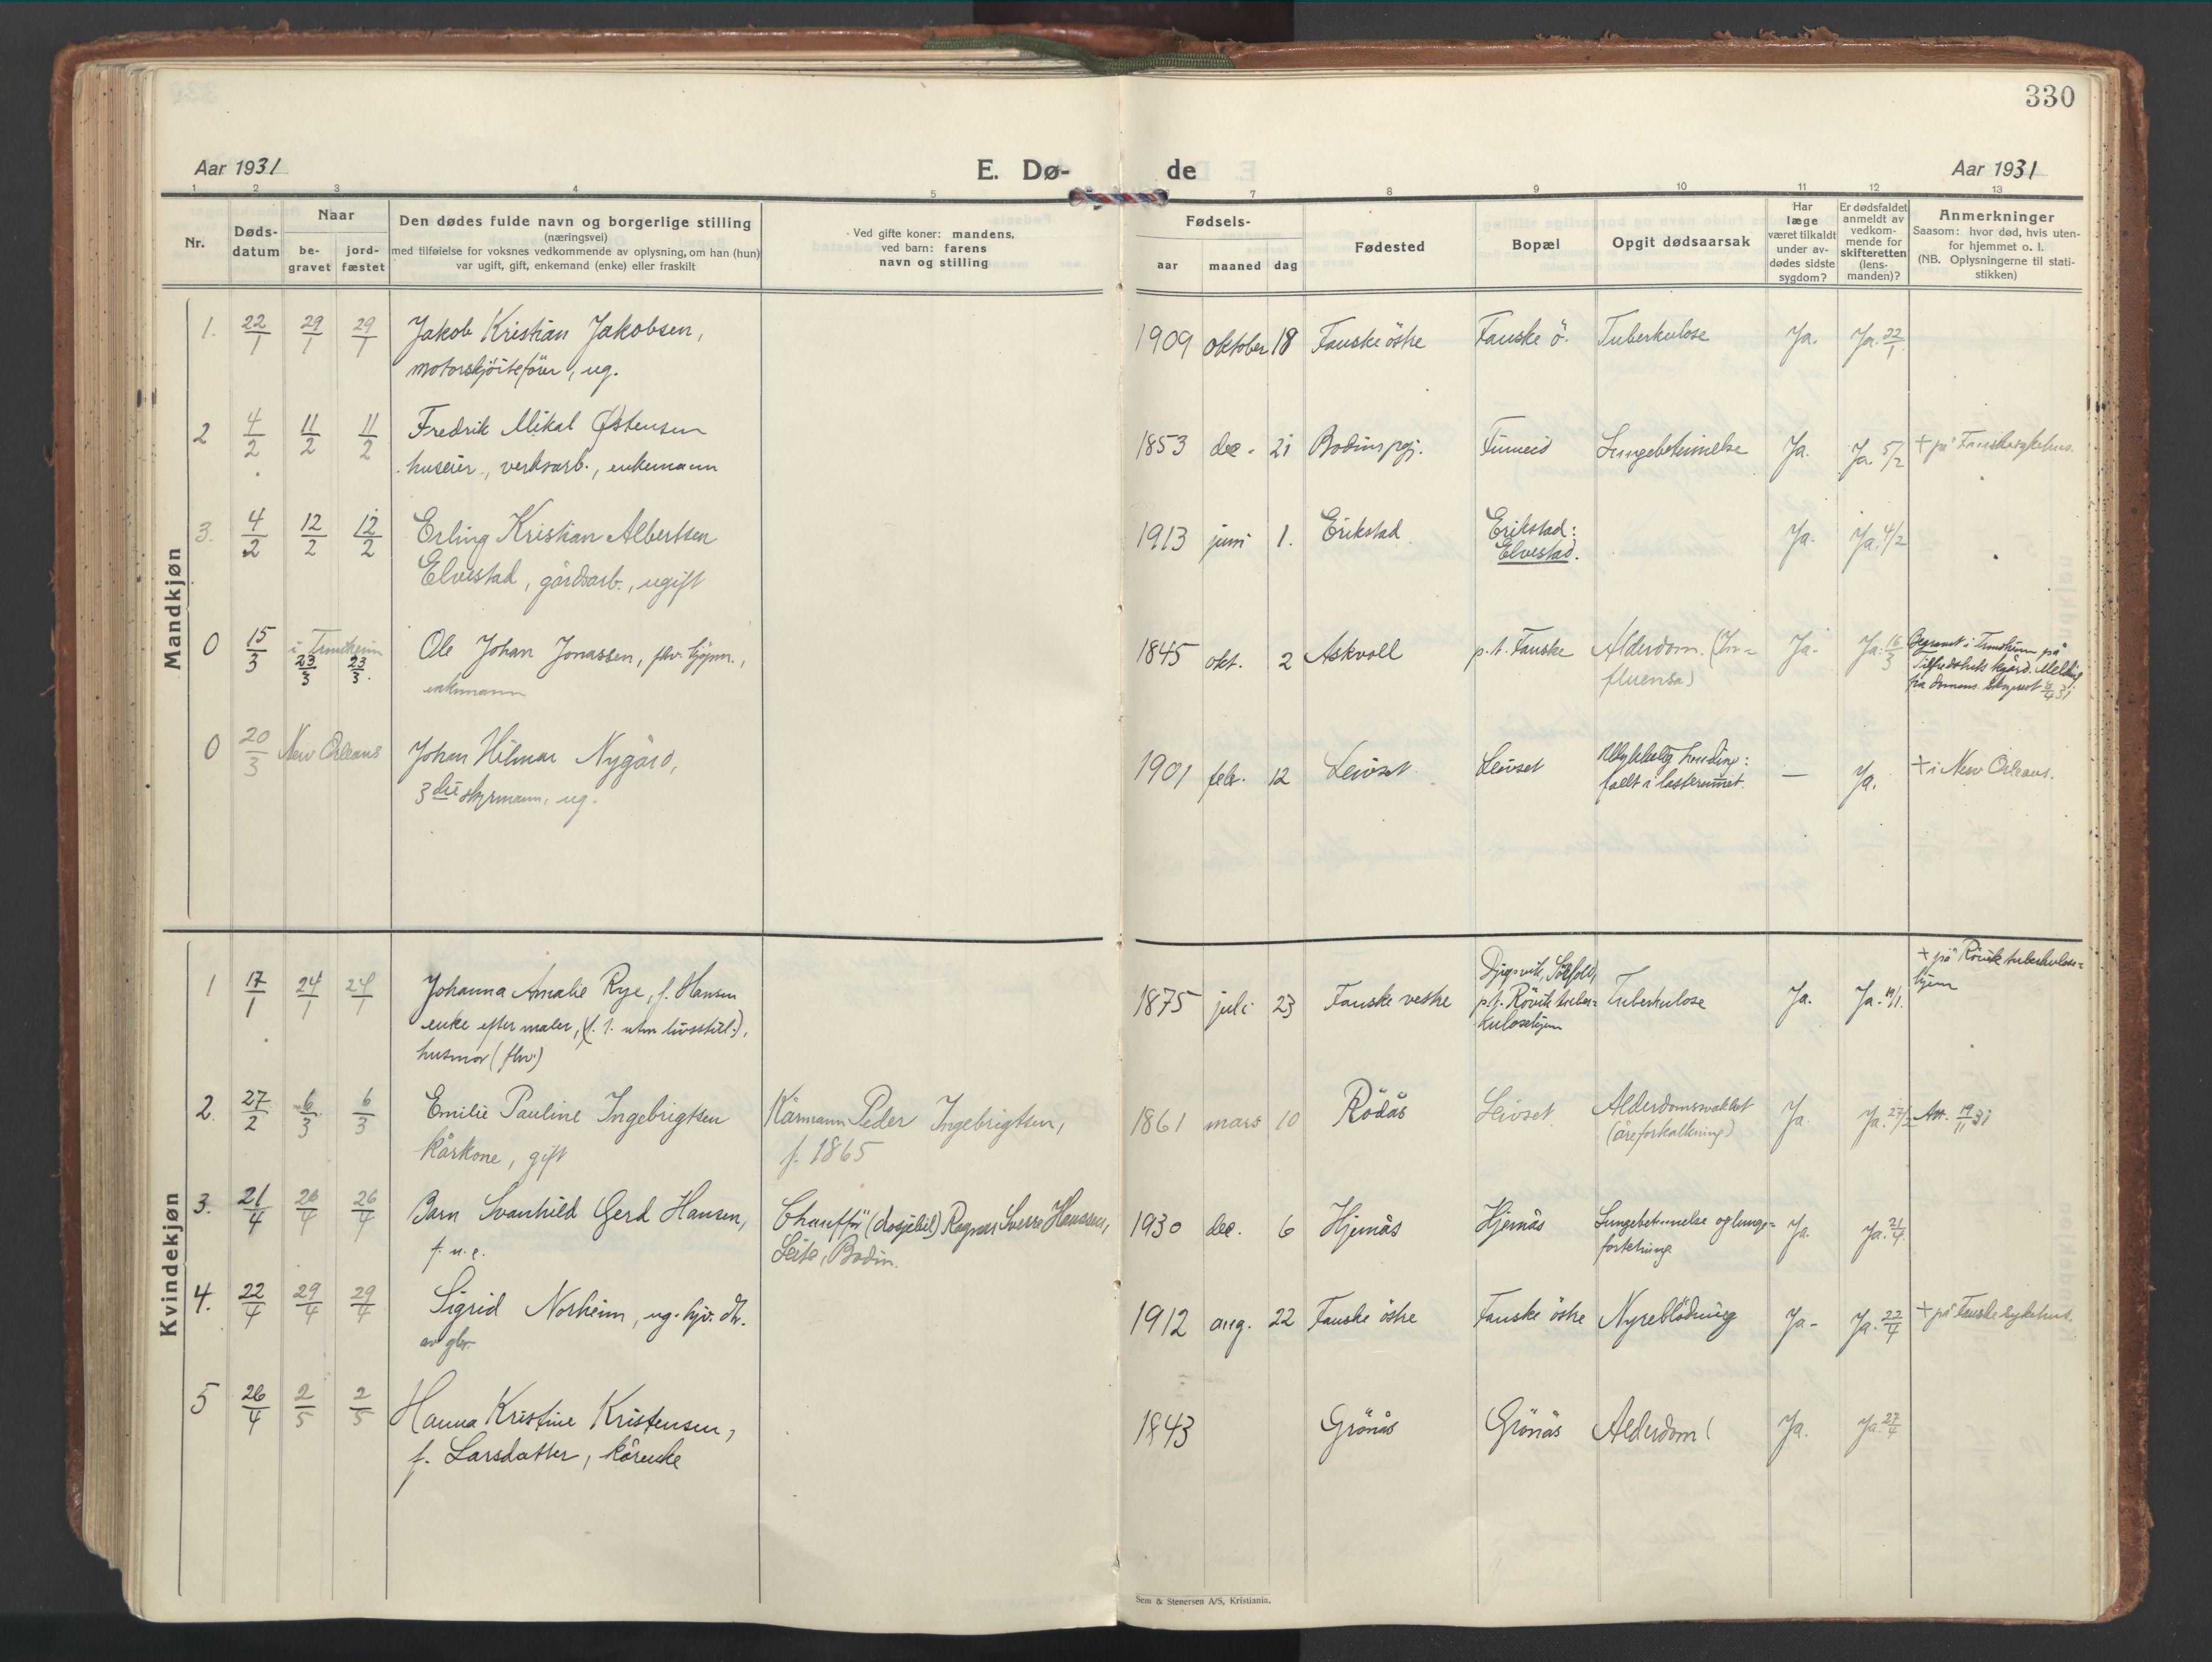 SAT, Ministerialprotokoller, klokkerbøker og fødselsregistre - Nordland, 849/L0699: Ministerialbok nr. 849A10, 1924-1937, s. 330